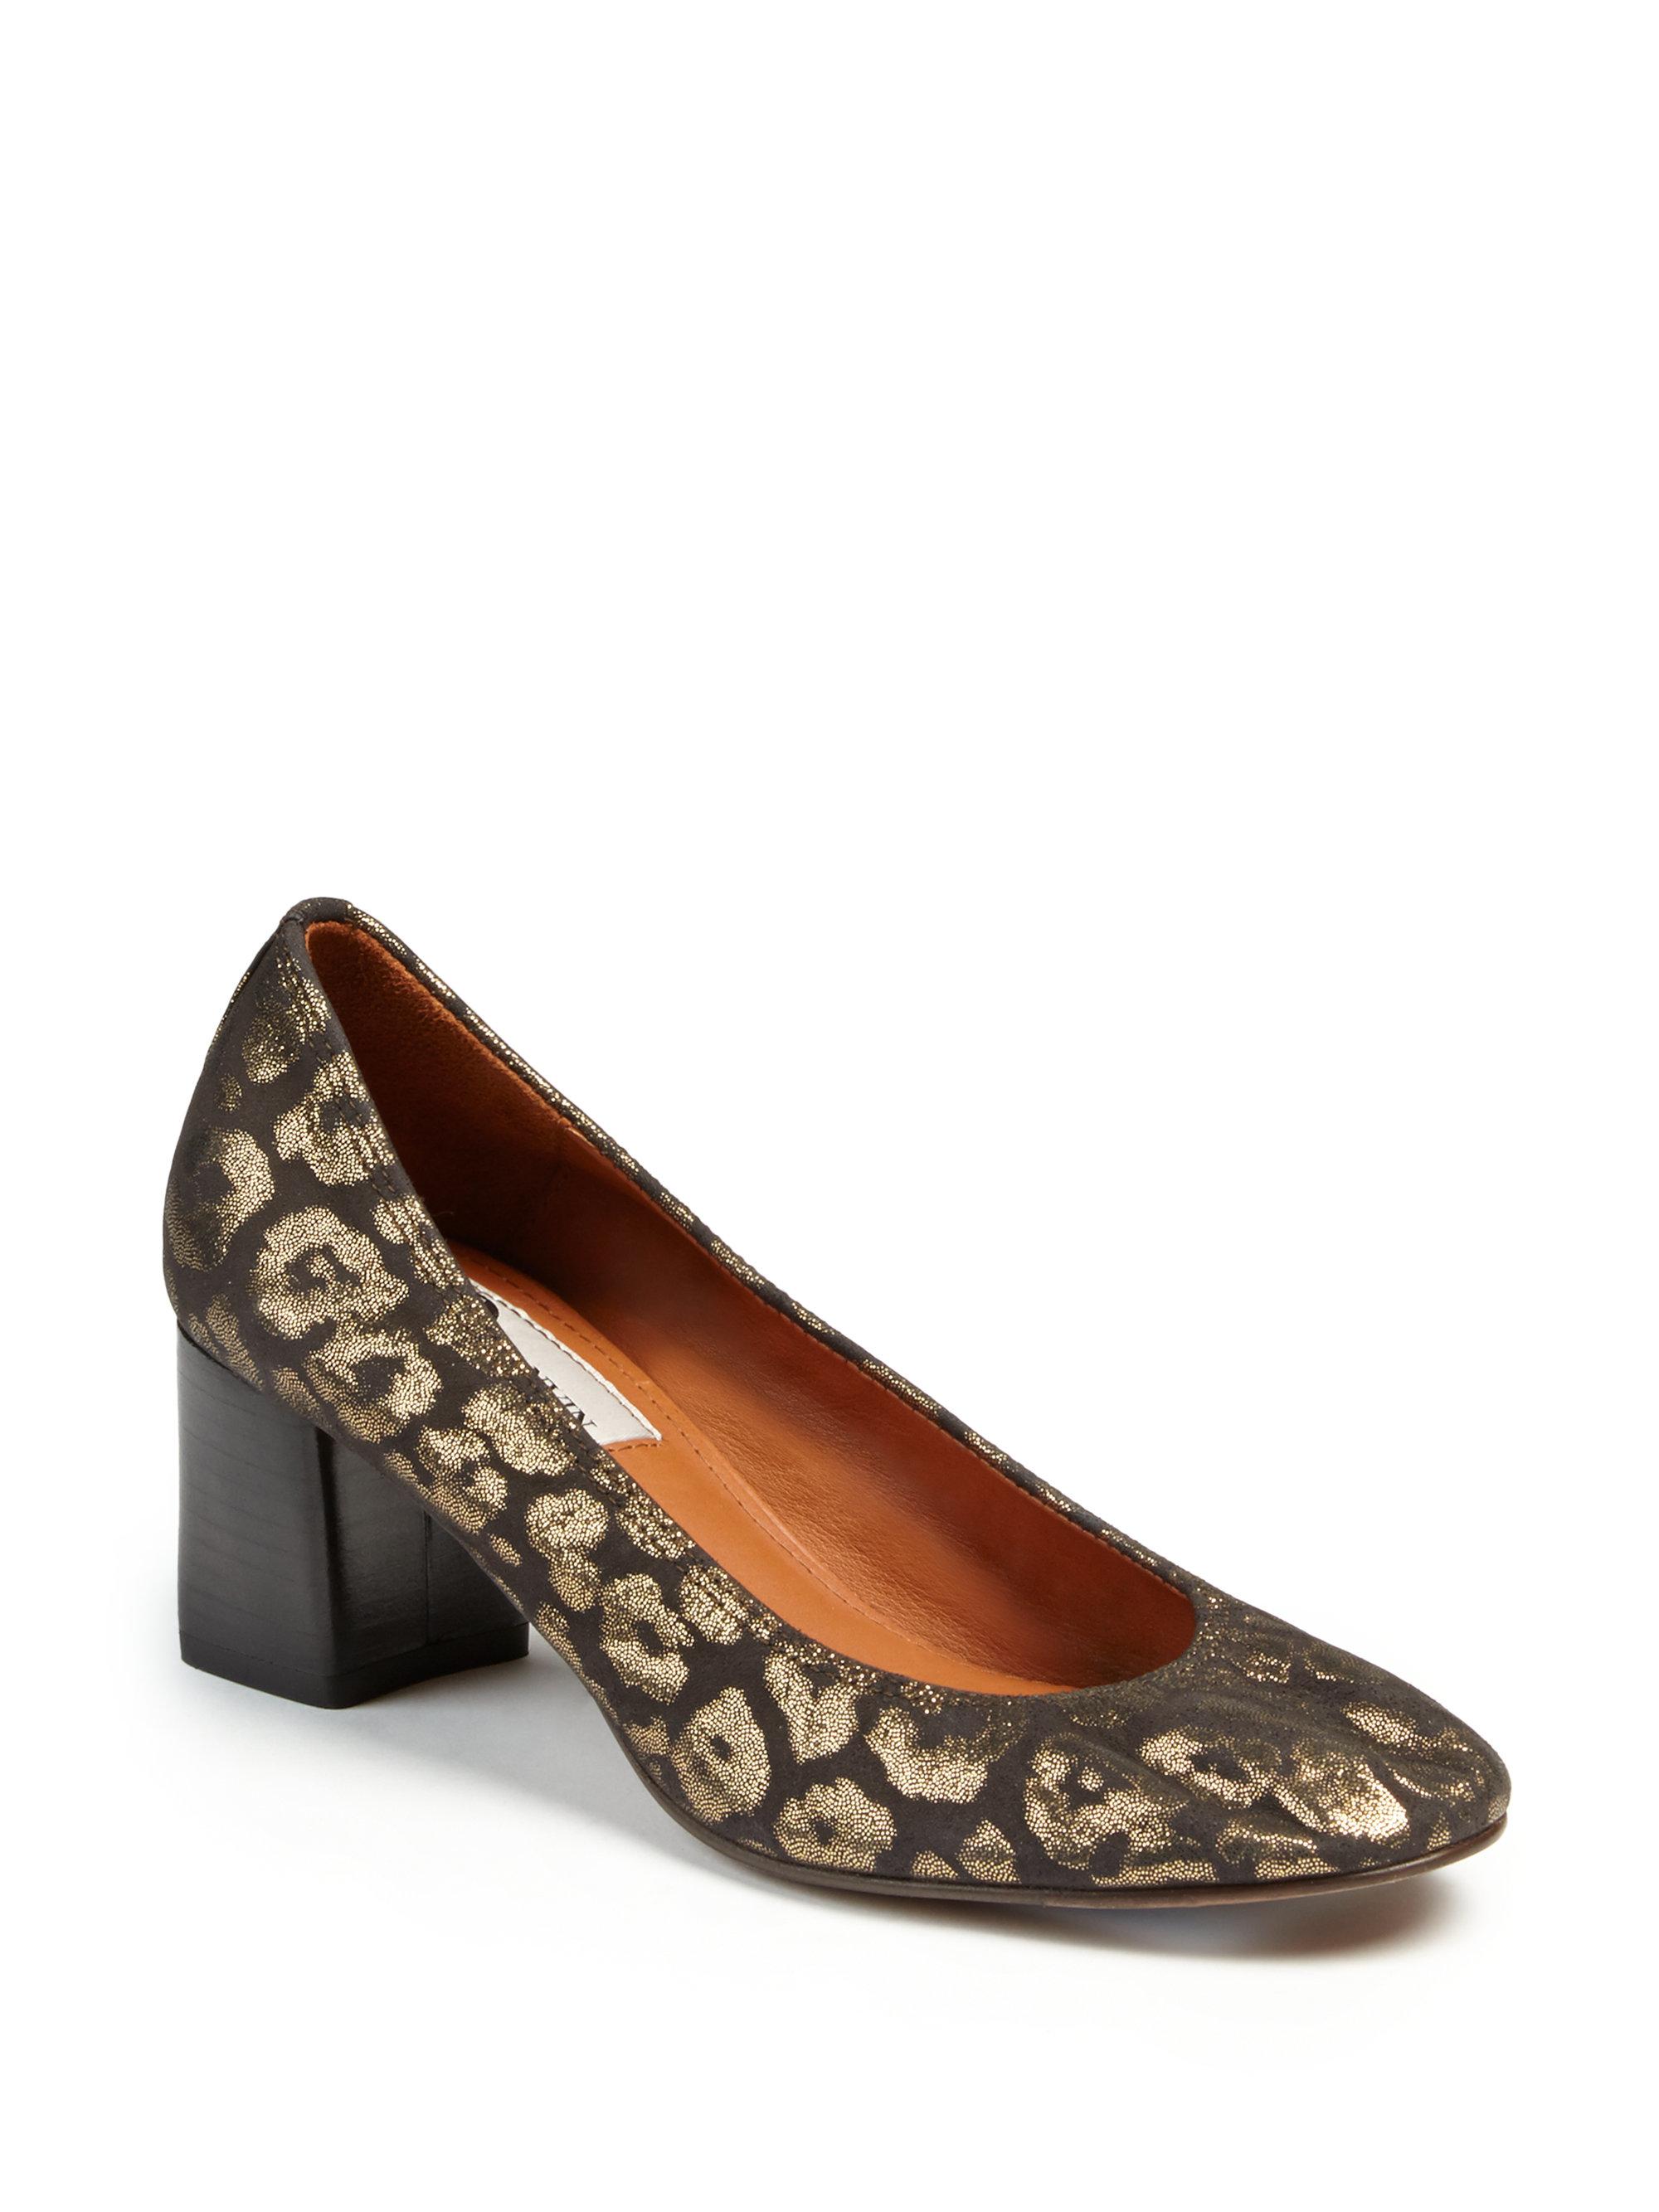 ea706166834 Lyst - Lanvin Block-heeled Metallic Leopard Leather Pumps in Metallic